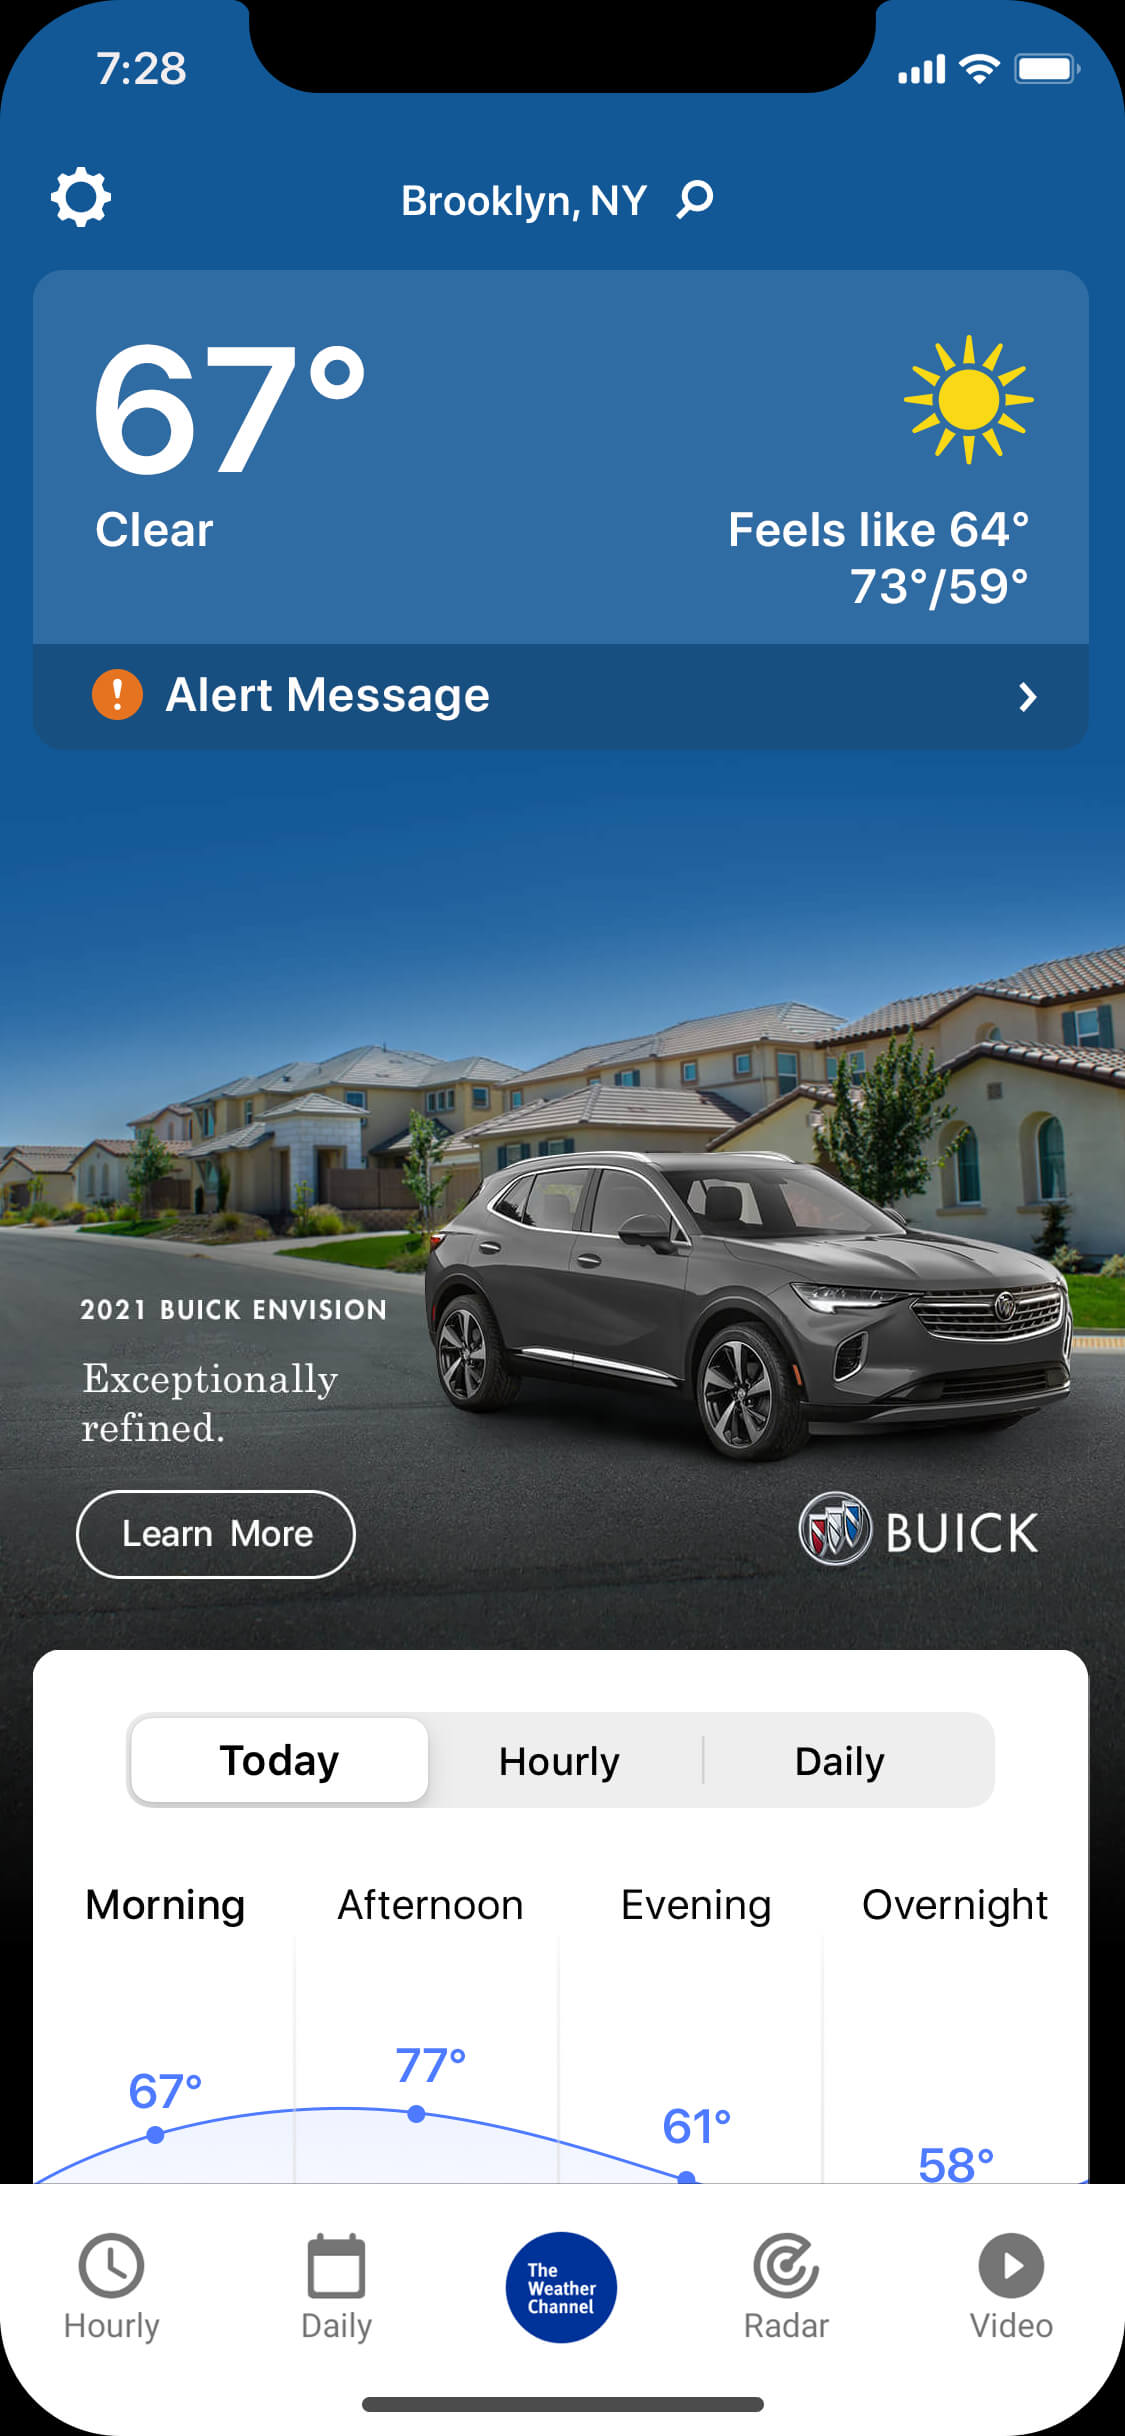 Buick-MAIM-clear-day